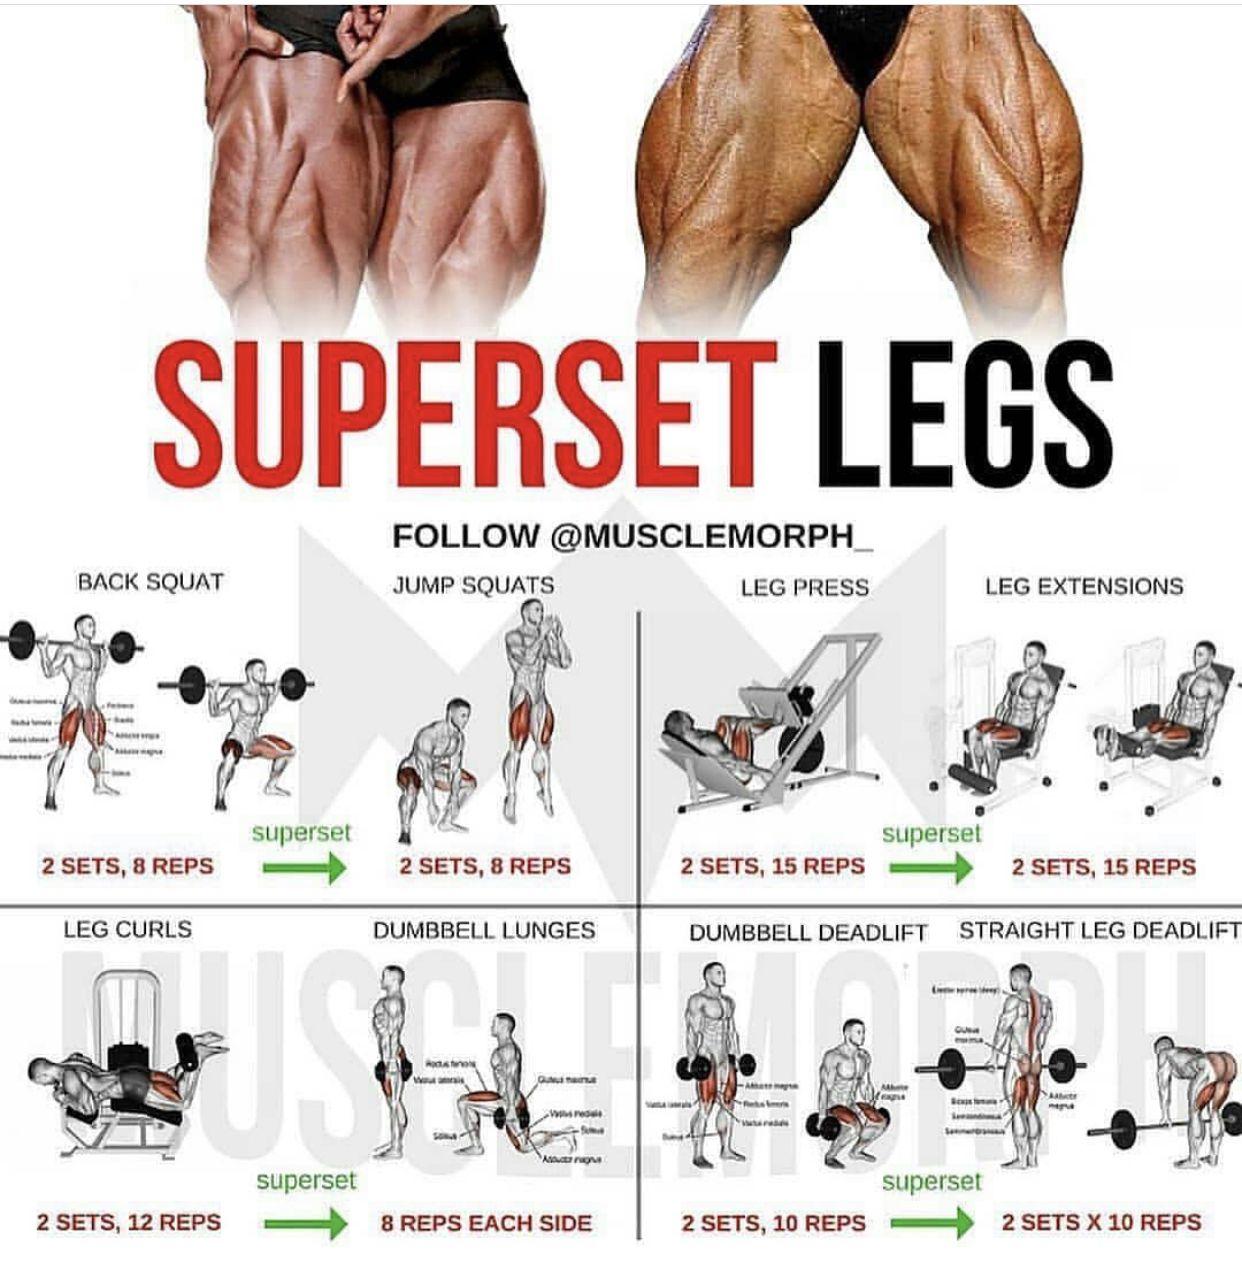 Pin by DAPIXARA on Fitness | Workout routine, Leg workouts ...